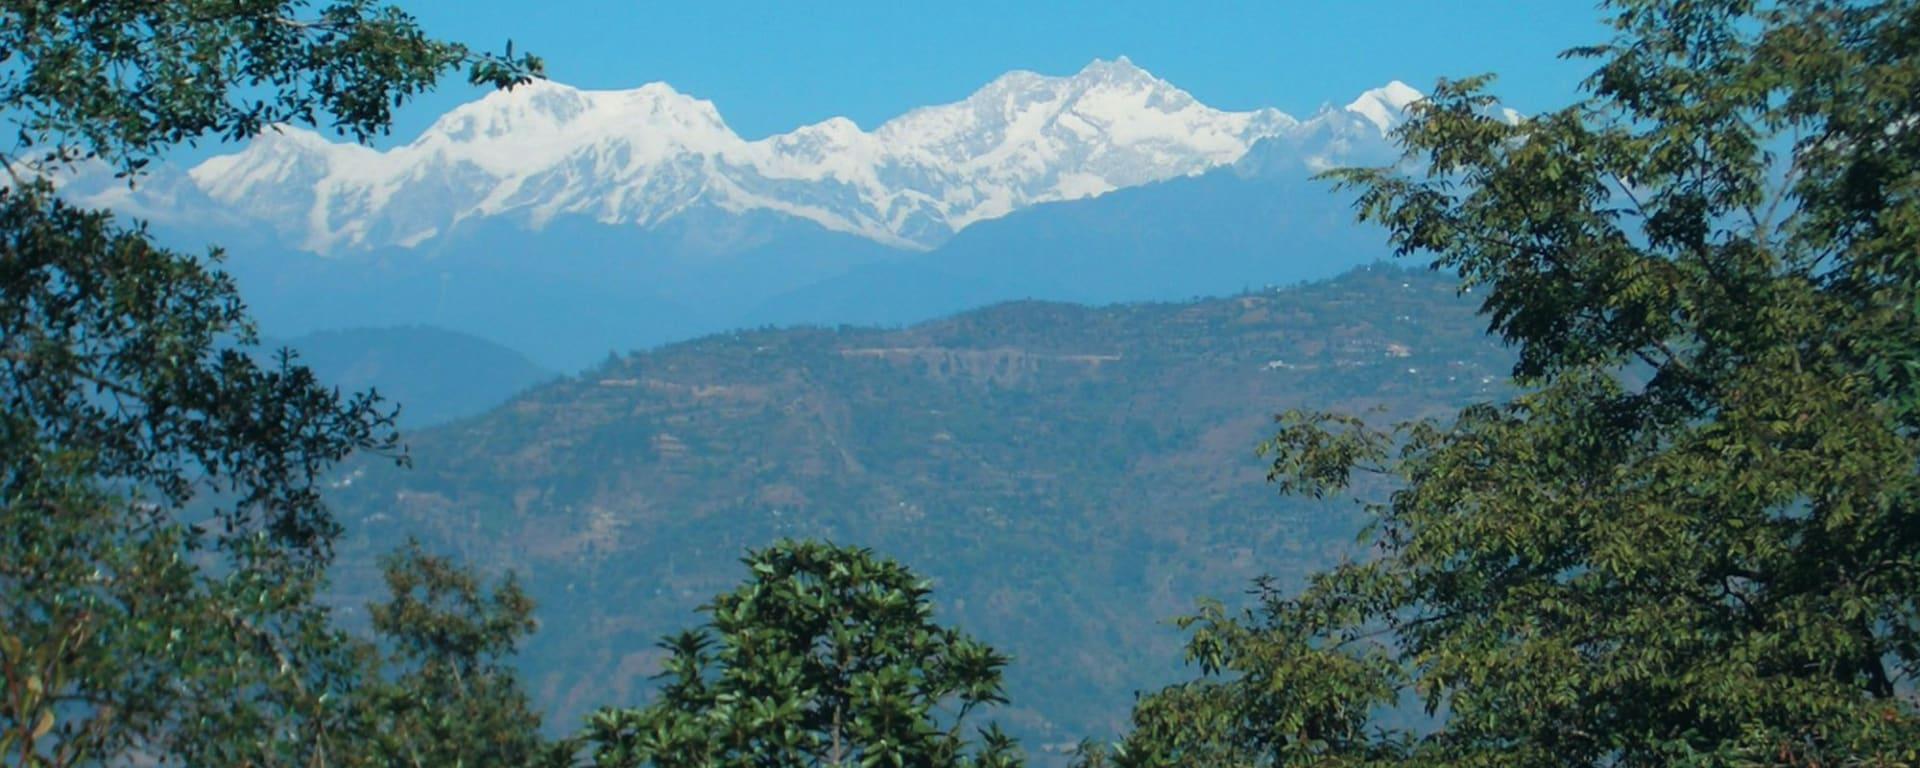 Glenburn Tea Estate à Darjeeling: View of Mountains from Glenburn